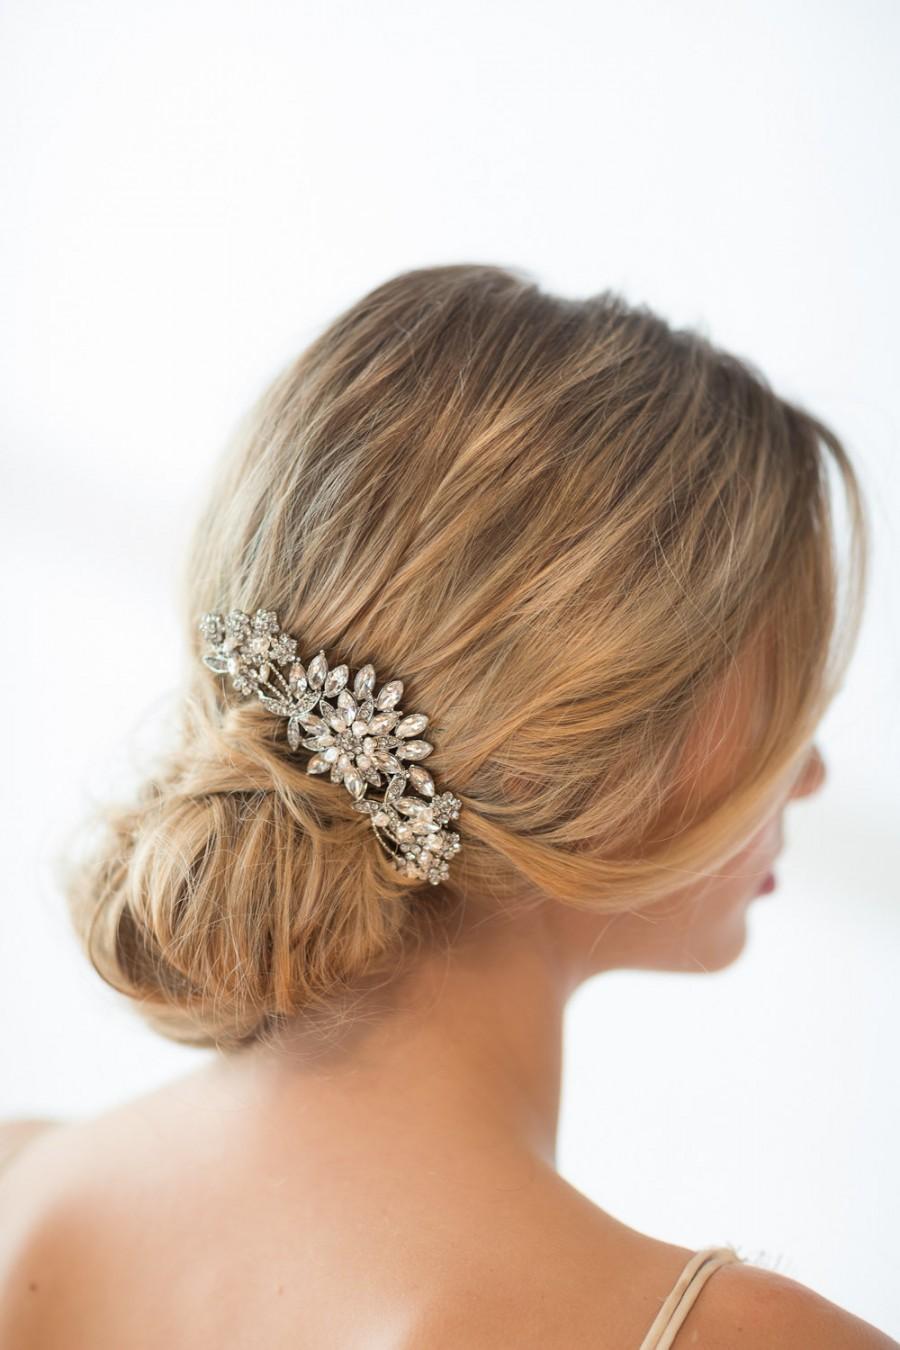 زفاف - Bridal Hair Comb, Crystal and Pearl Comb, Wedding Hair Comb